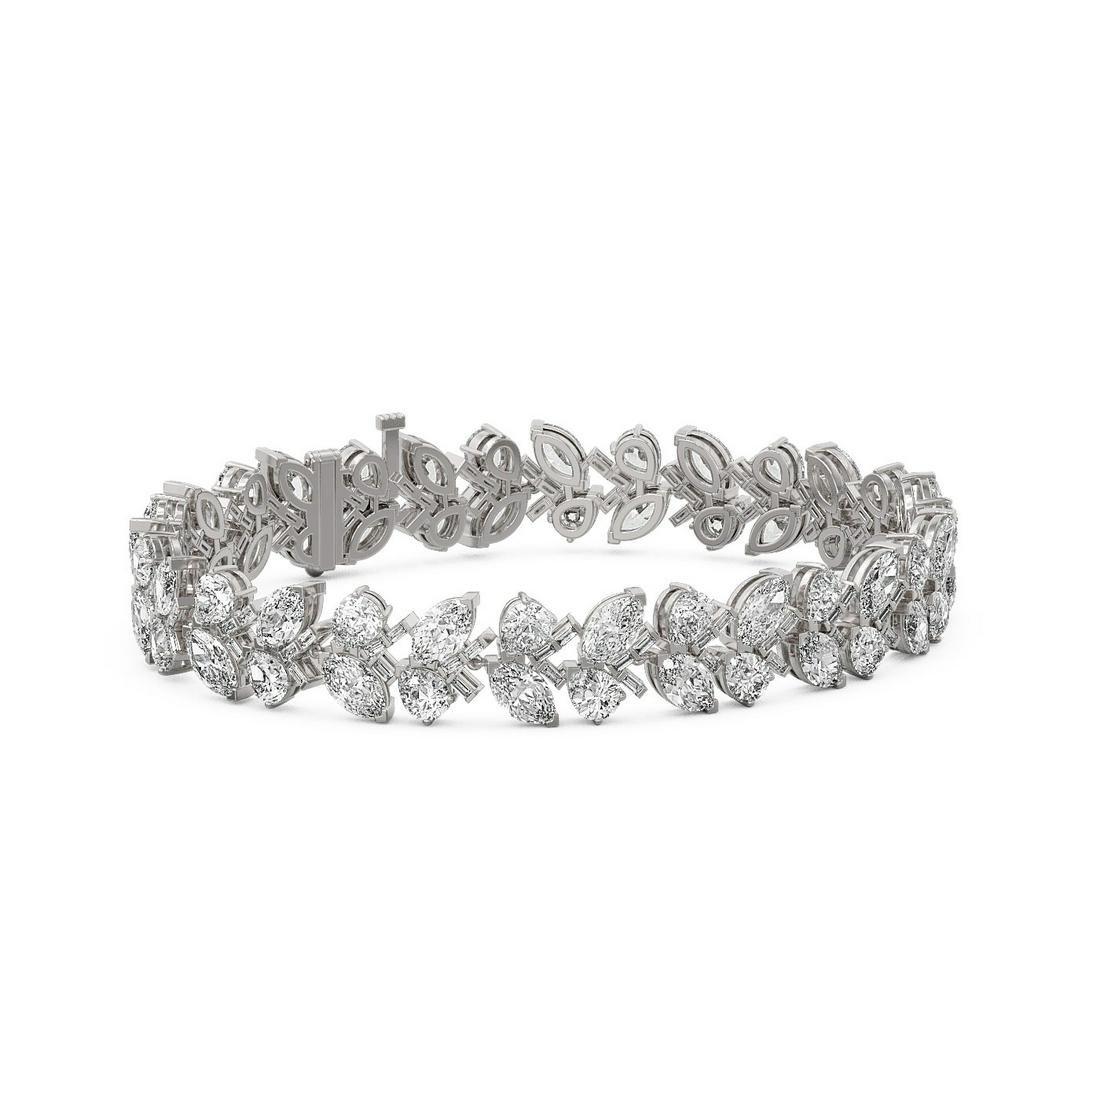 24 ctw Marquise & Pear Cut Diamond Bracelet 18K White